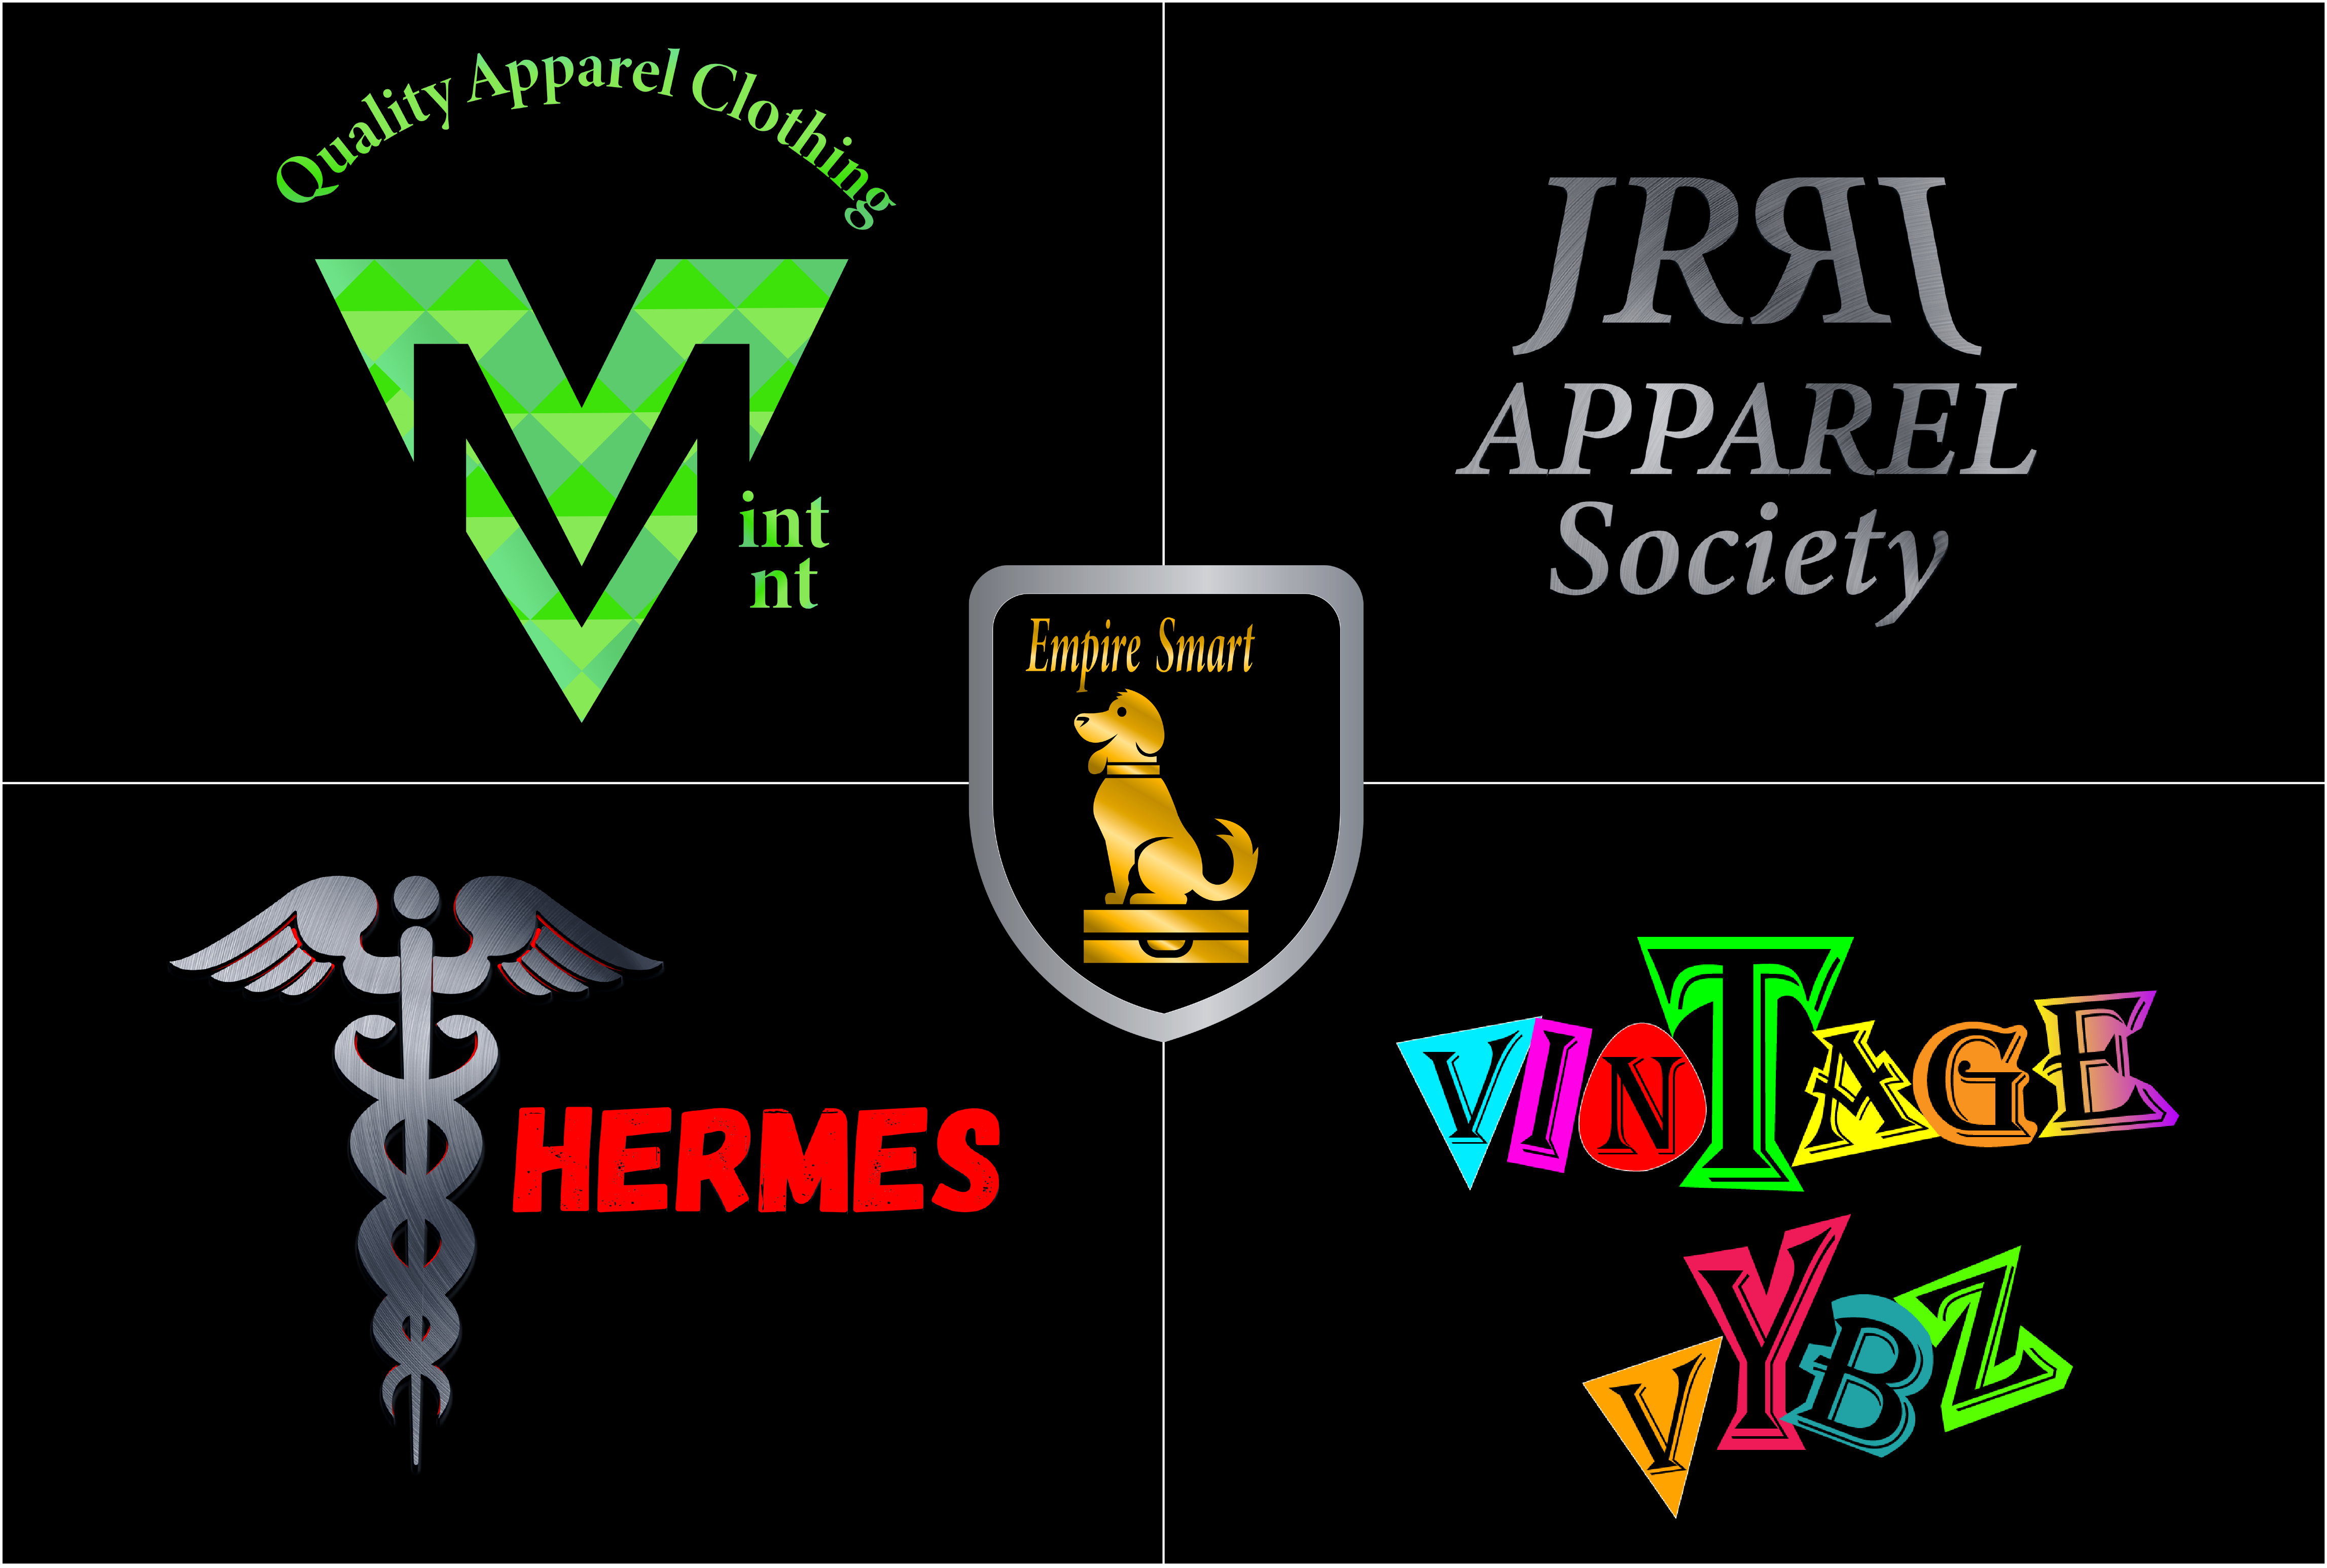 I will design professional urban streetwear clothing brand logo